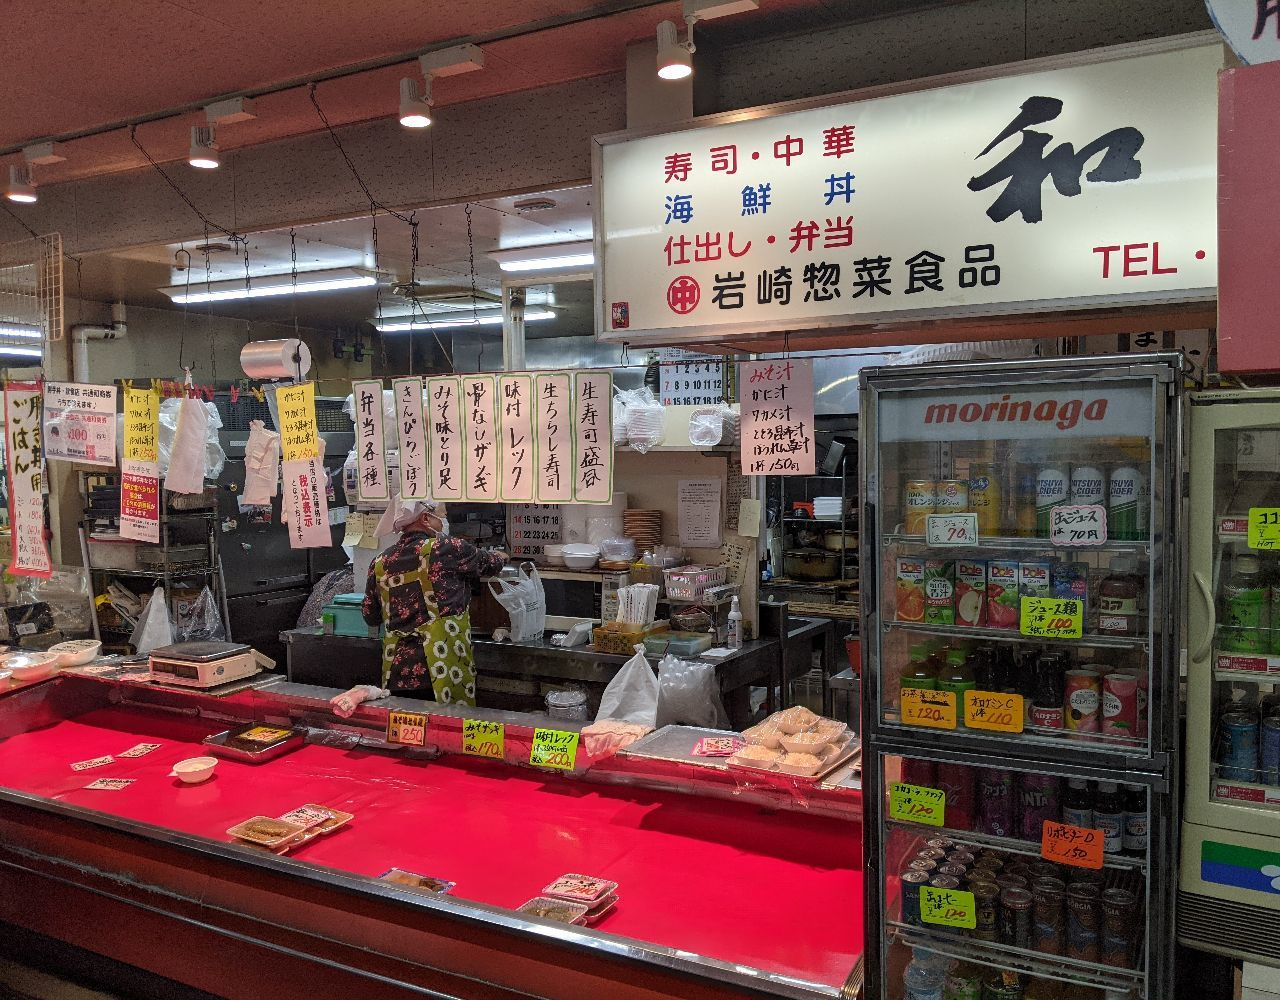 PXL_20210312_225540186岩崎惣菜食品